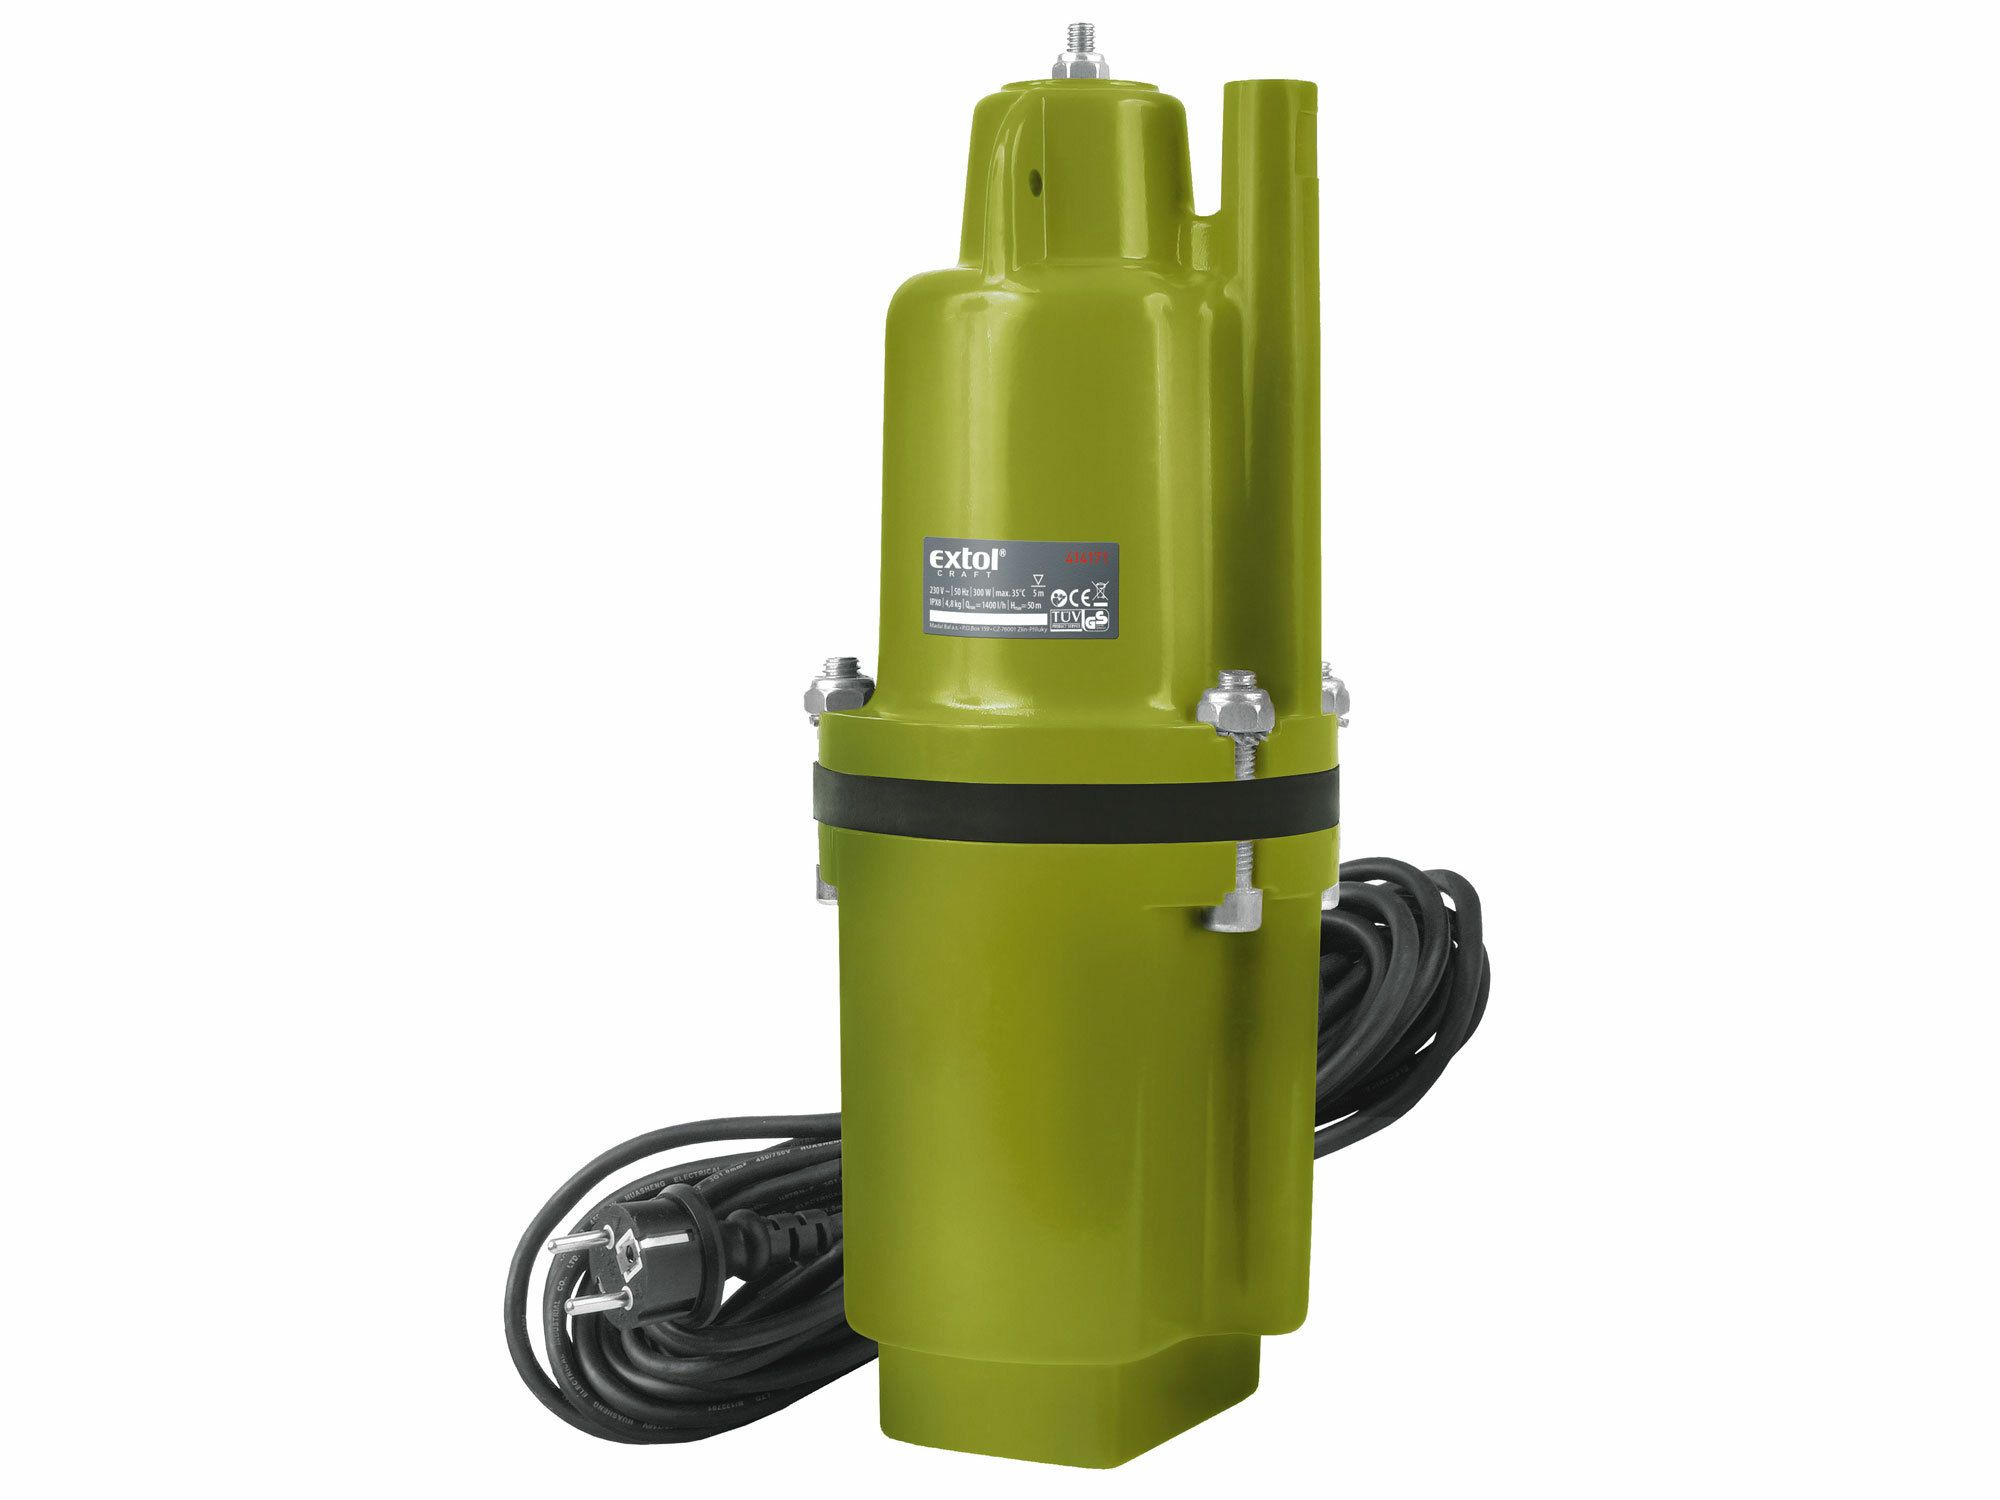 Čerpadlo membránové hlubinné ponorné, 300W, 1400l/hod, 20m, EXTOL CRAFT, 414171